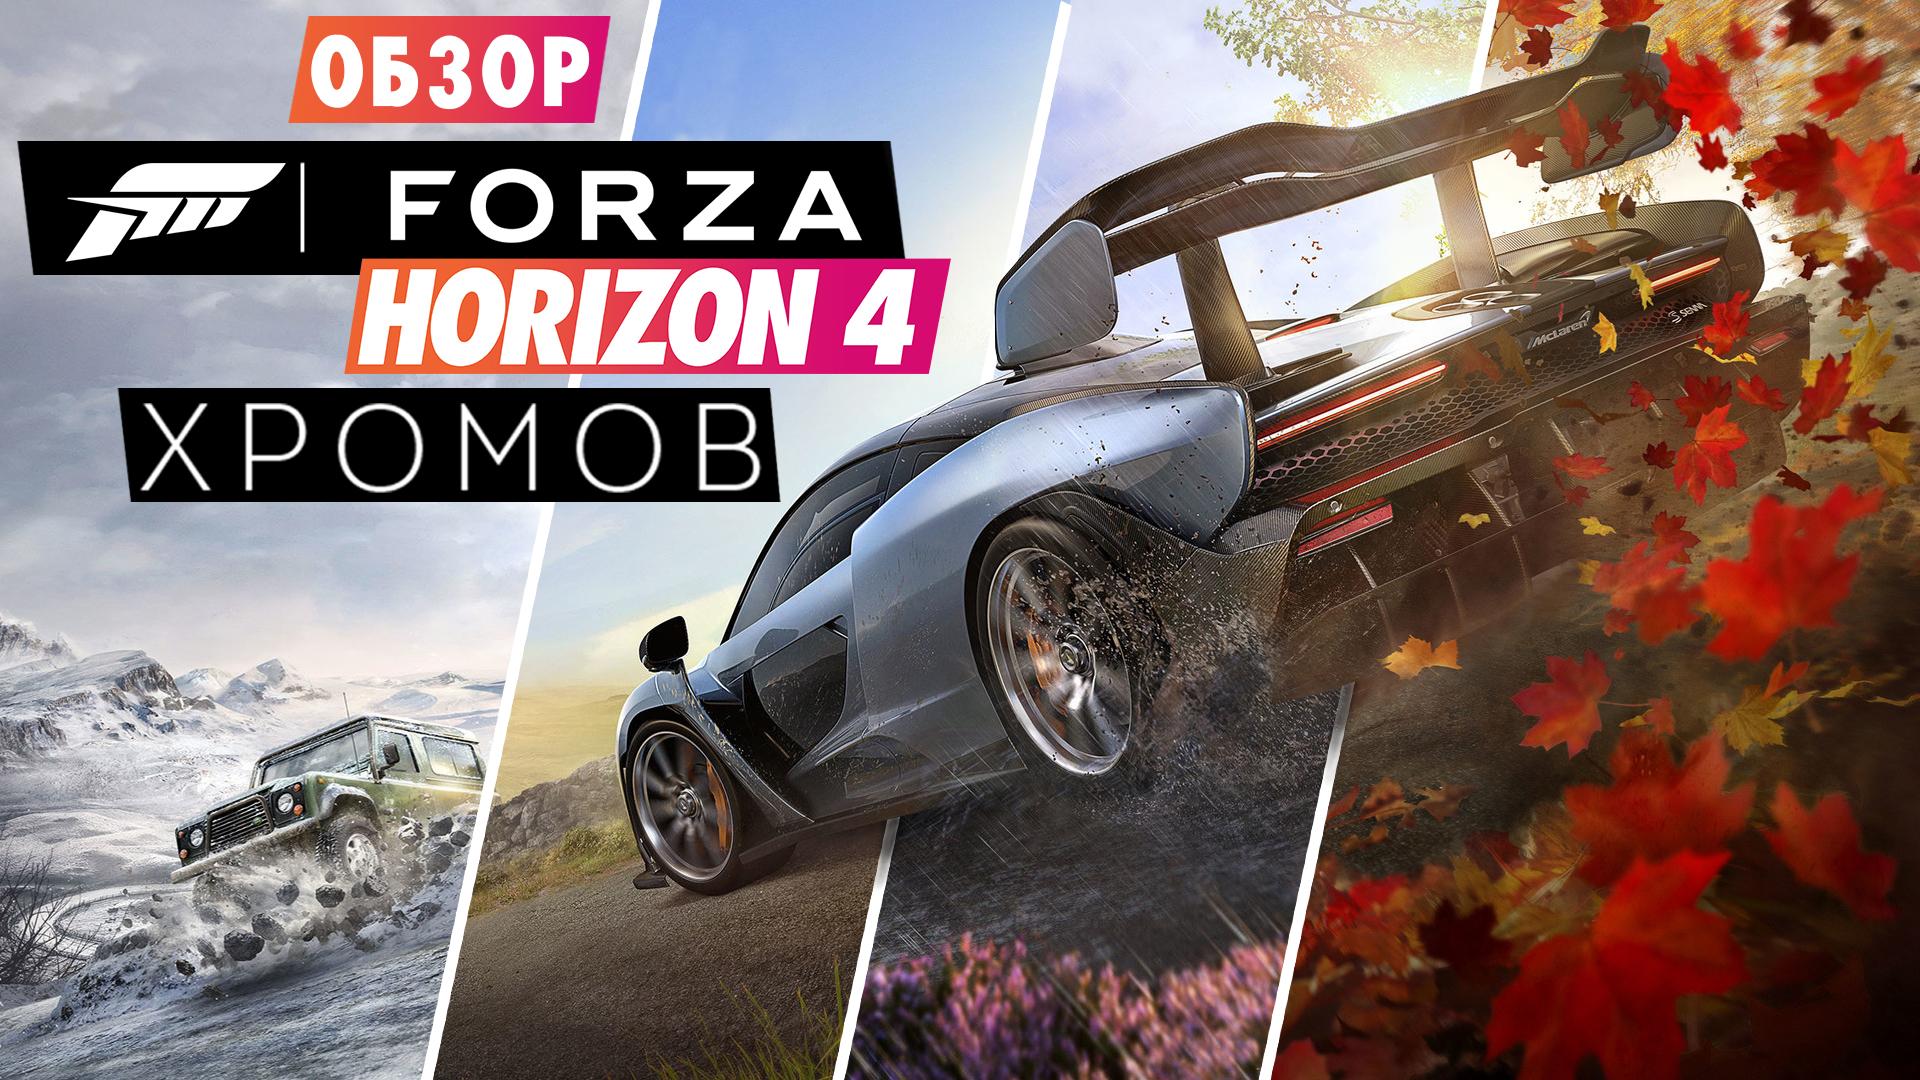 Обзор Forza Horizon 4 - Социалка на колёсах. - Изображение 1